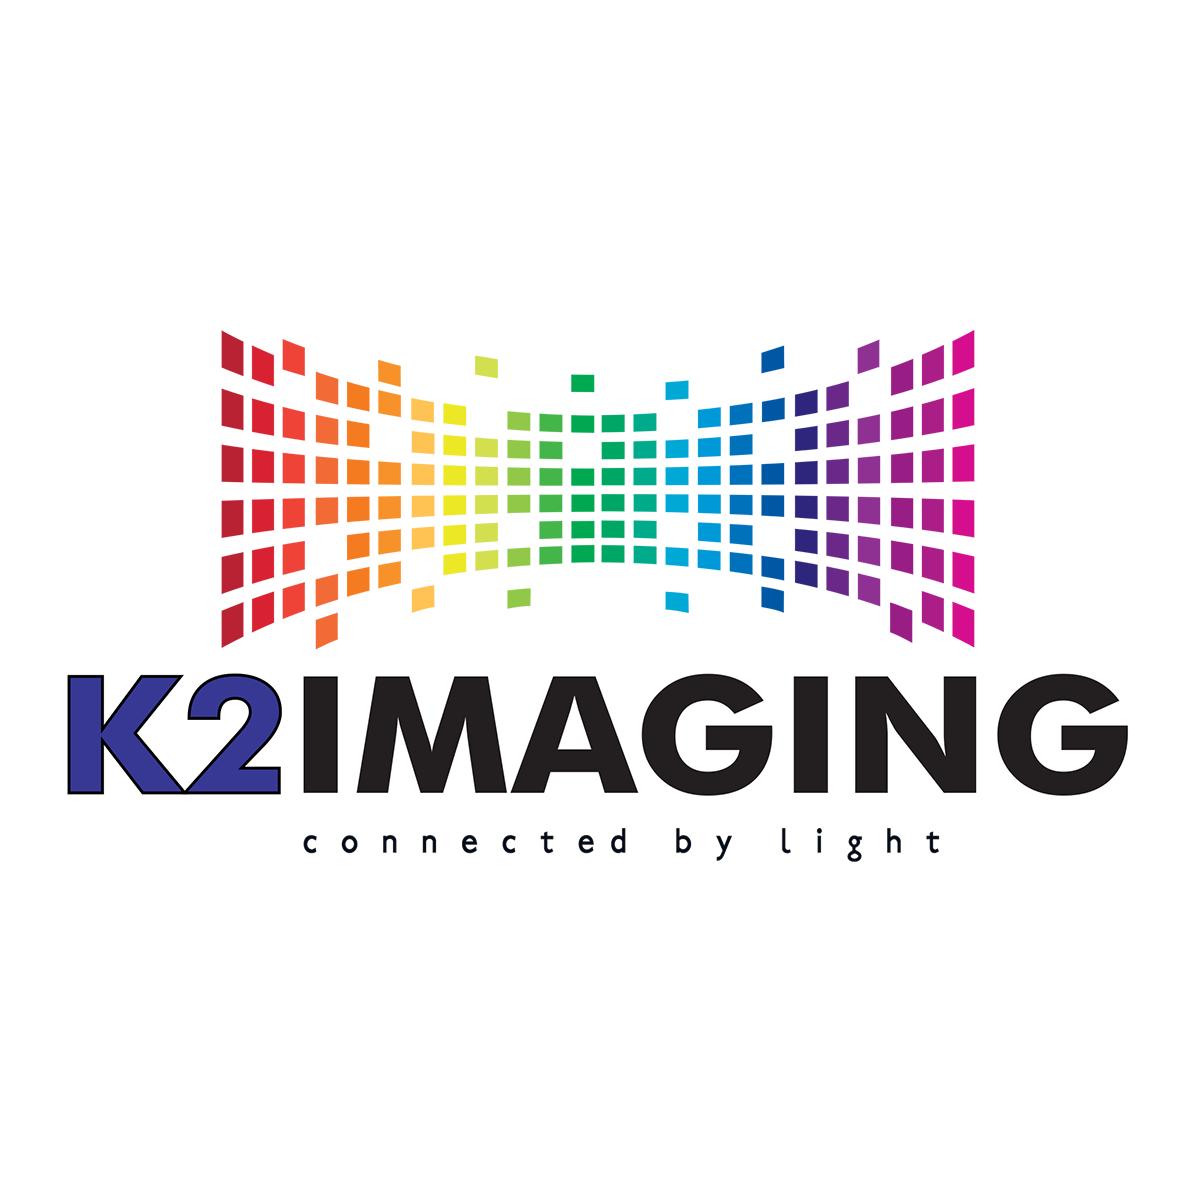 web-ready-K2Imaging.png